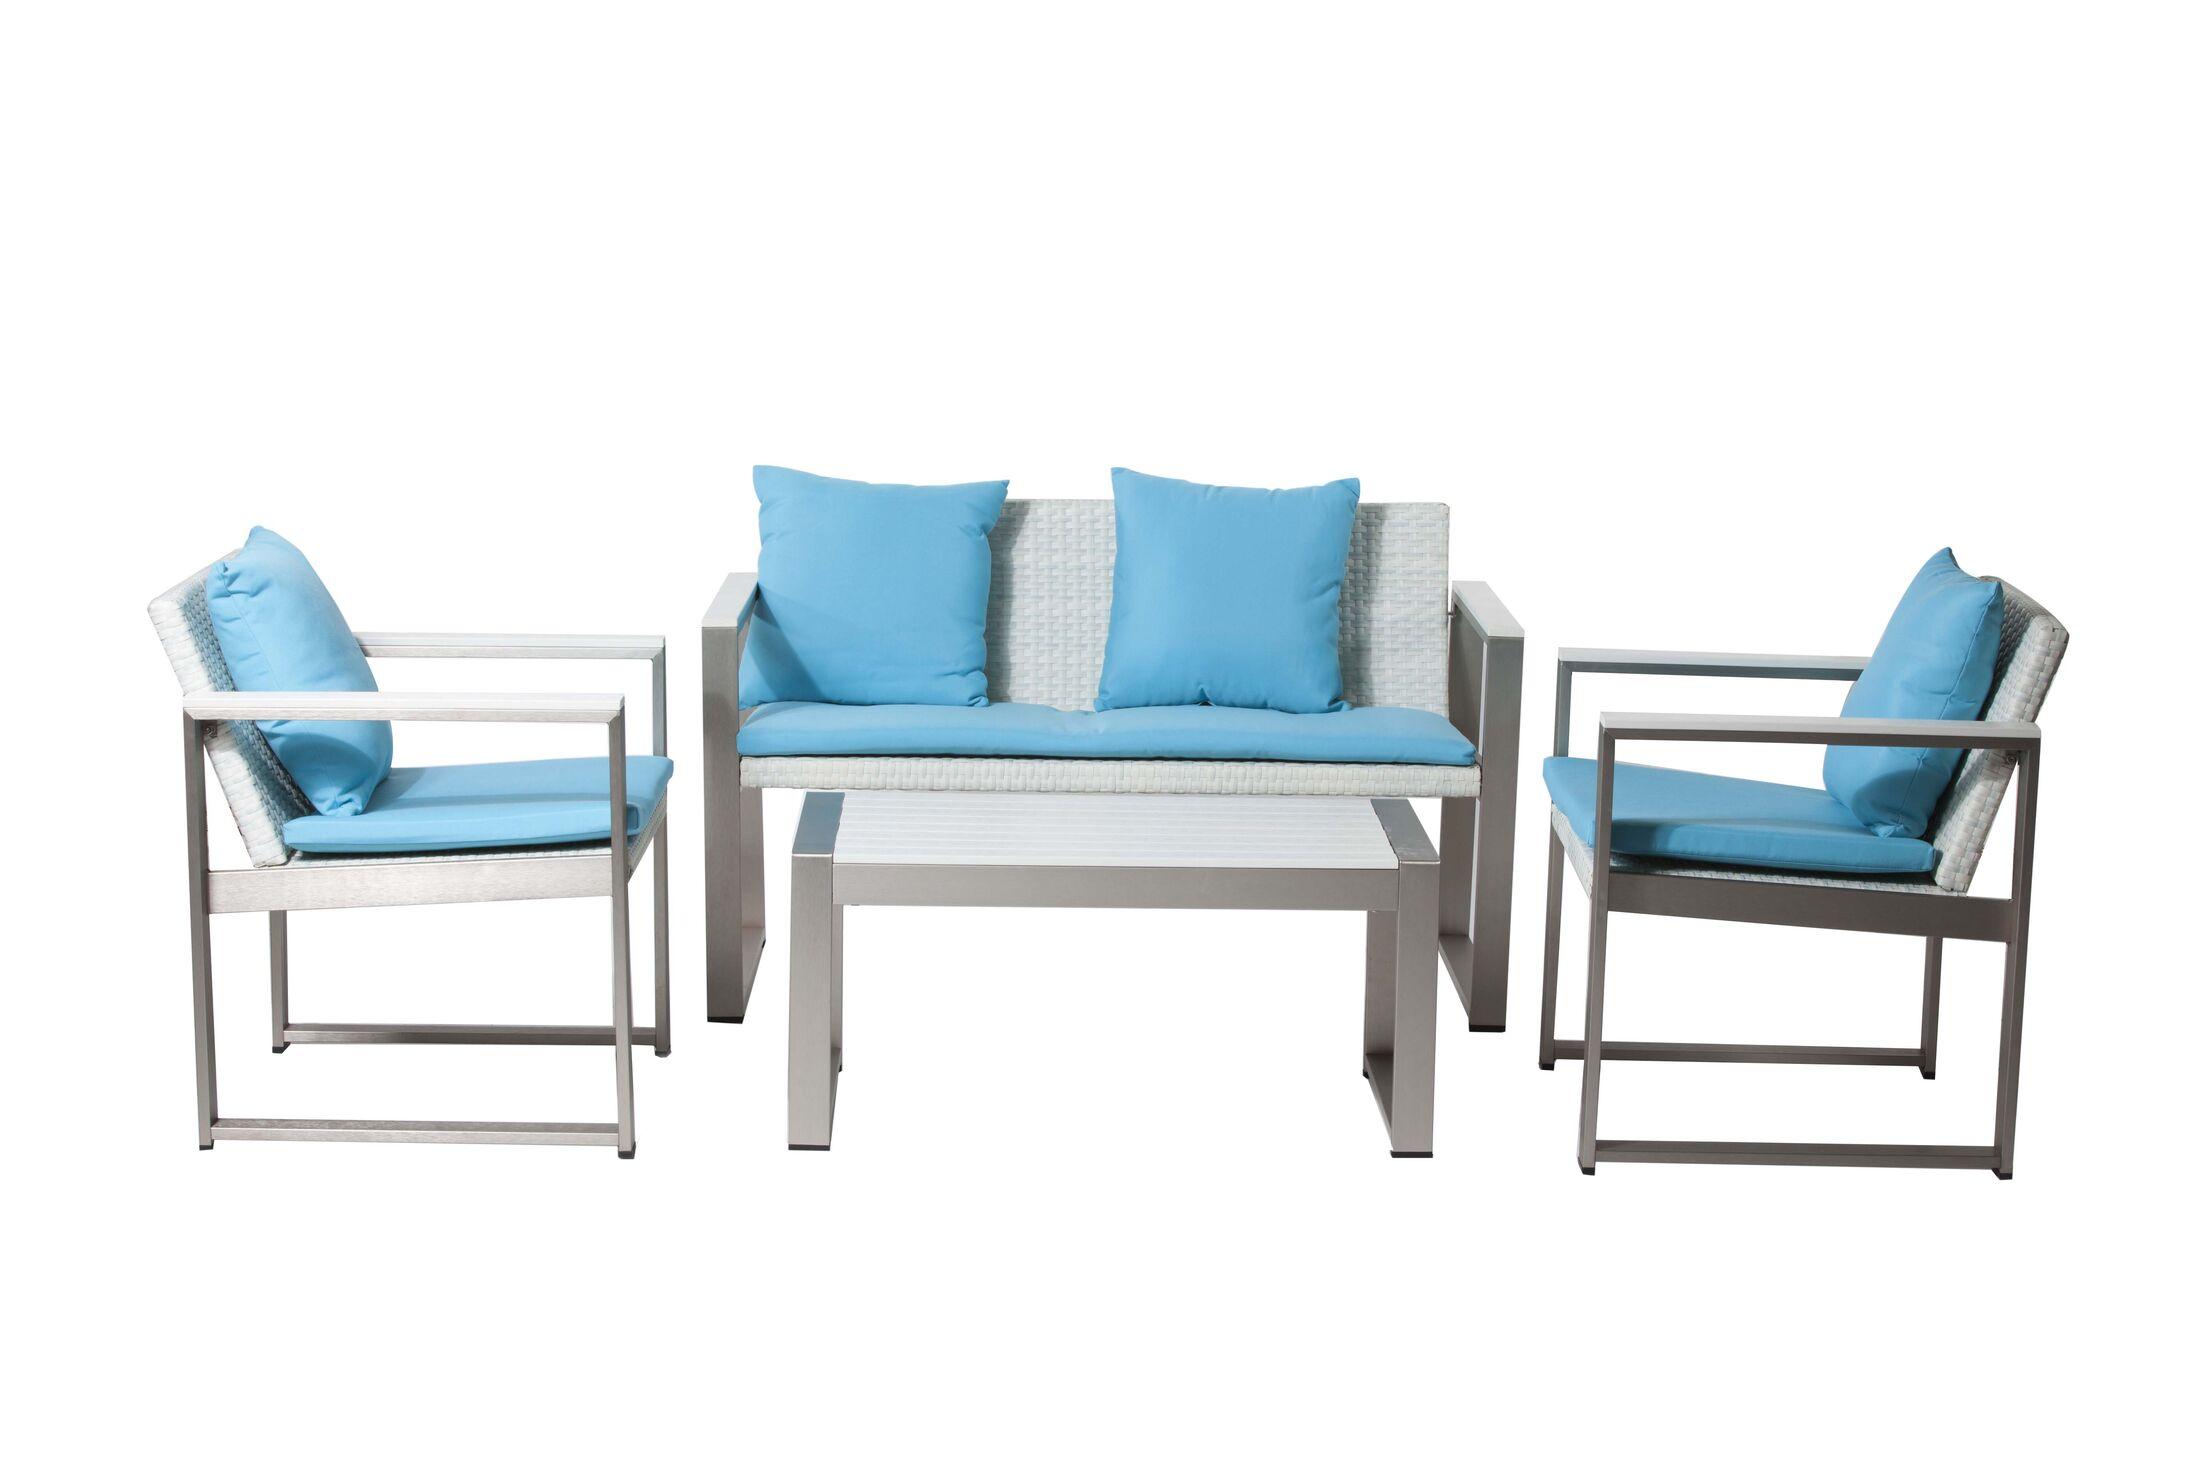 Windsor Rise 4 Piece Sofa Set with Cushions Fabric: White / Turquoise